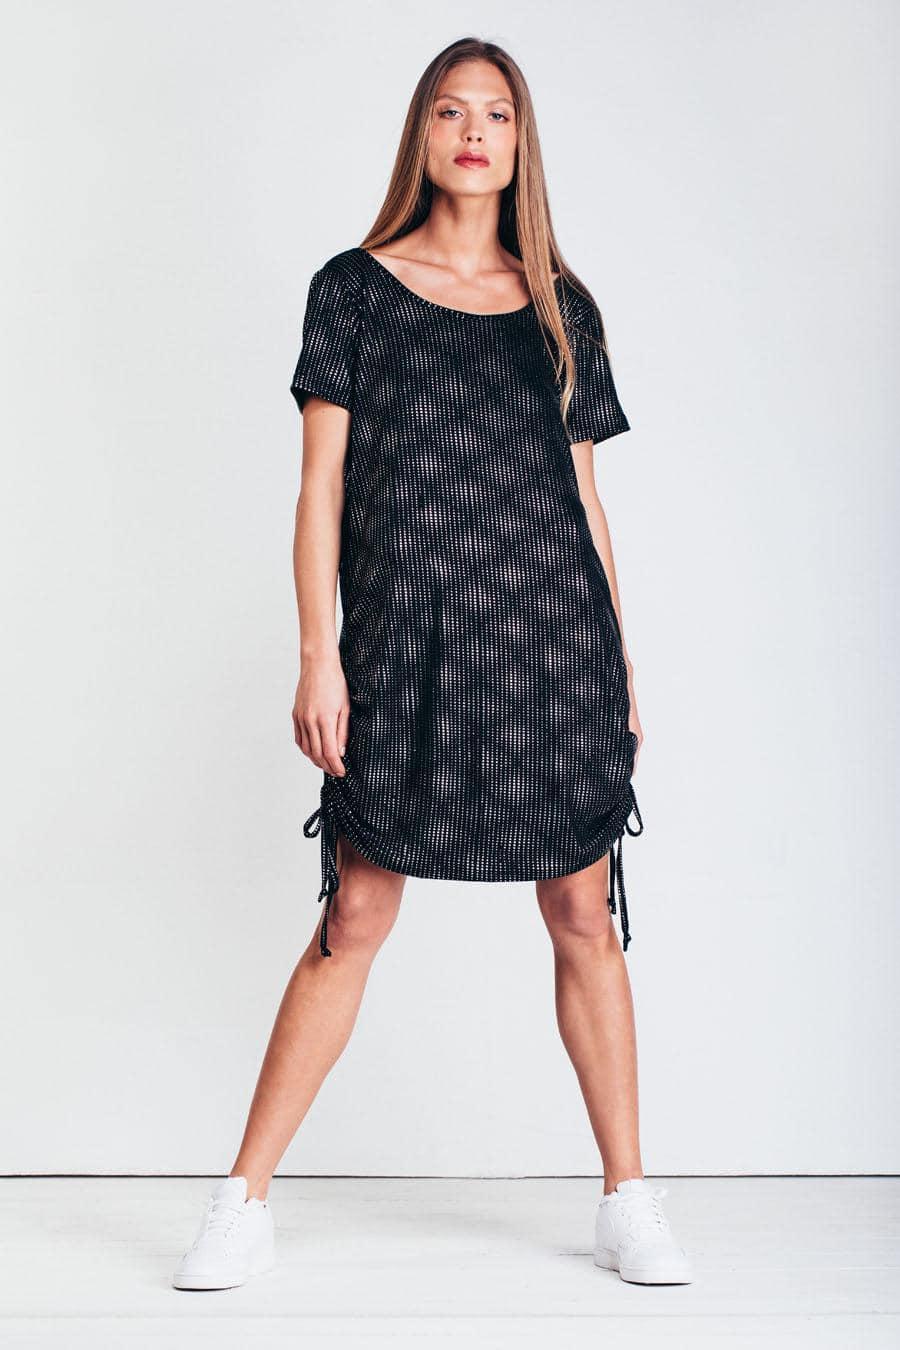 jagger zenska haljina kolekcija prolece leto 2021 ss 2021 kupi online jg 8456 01 1